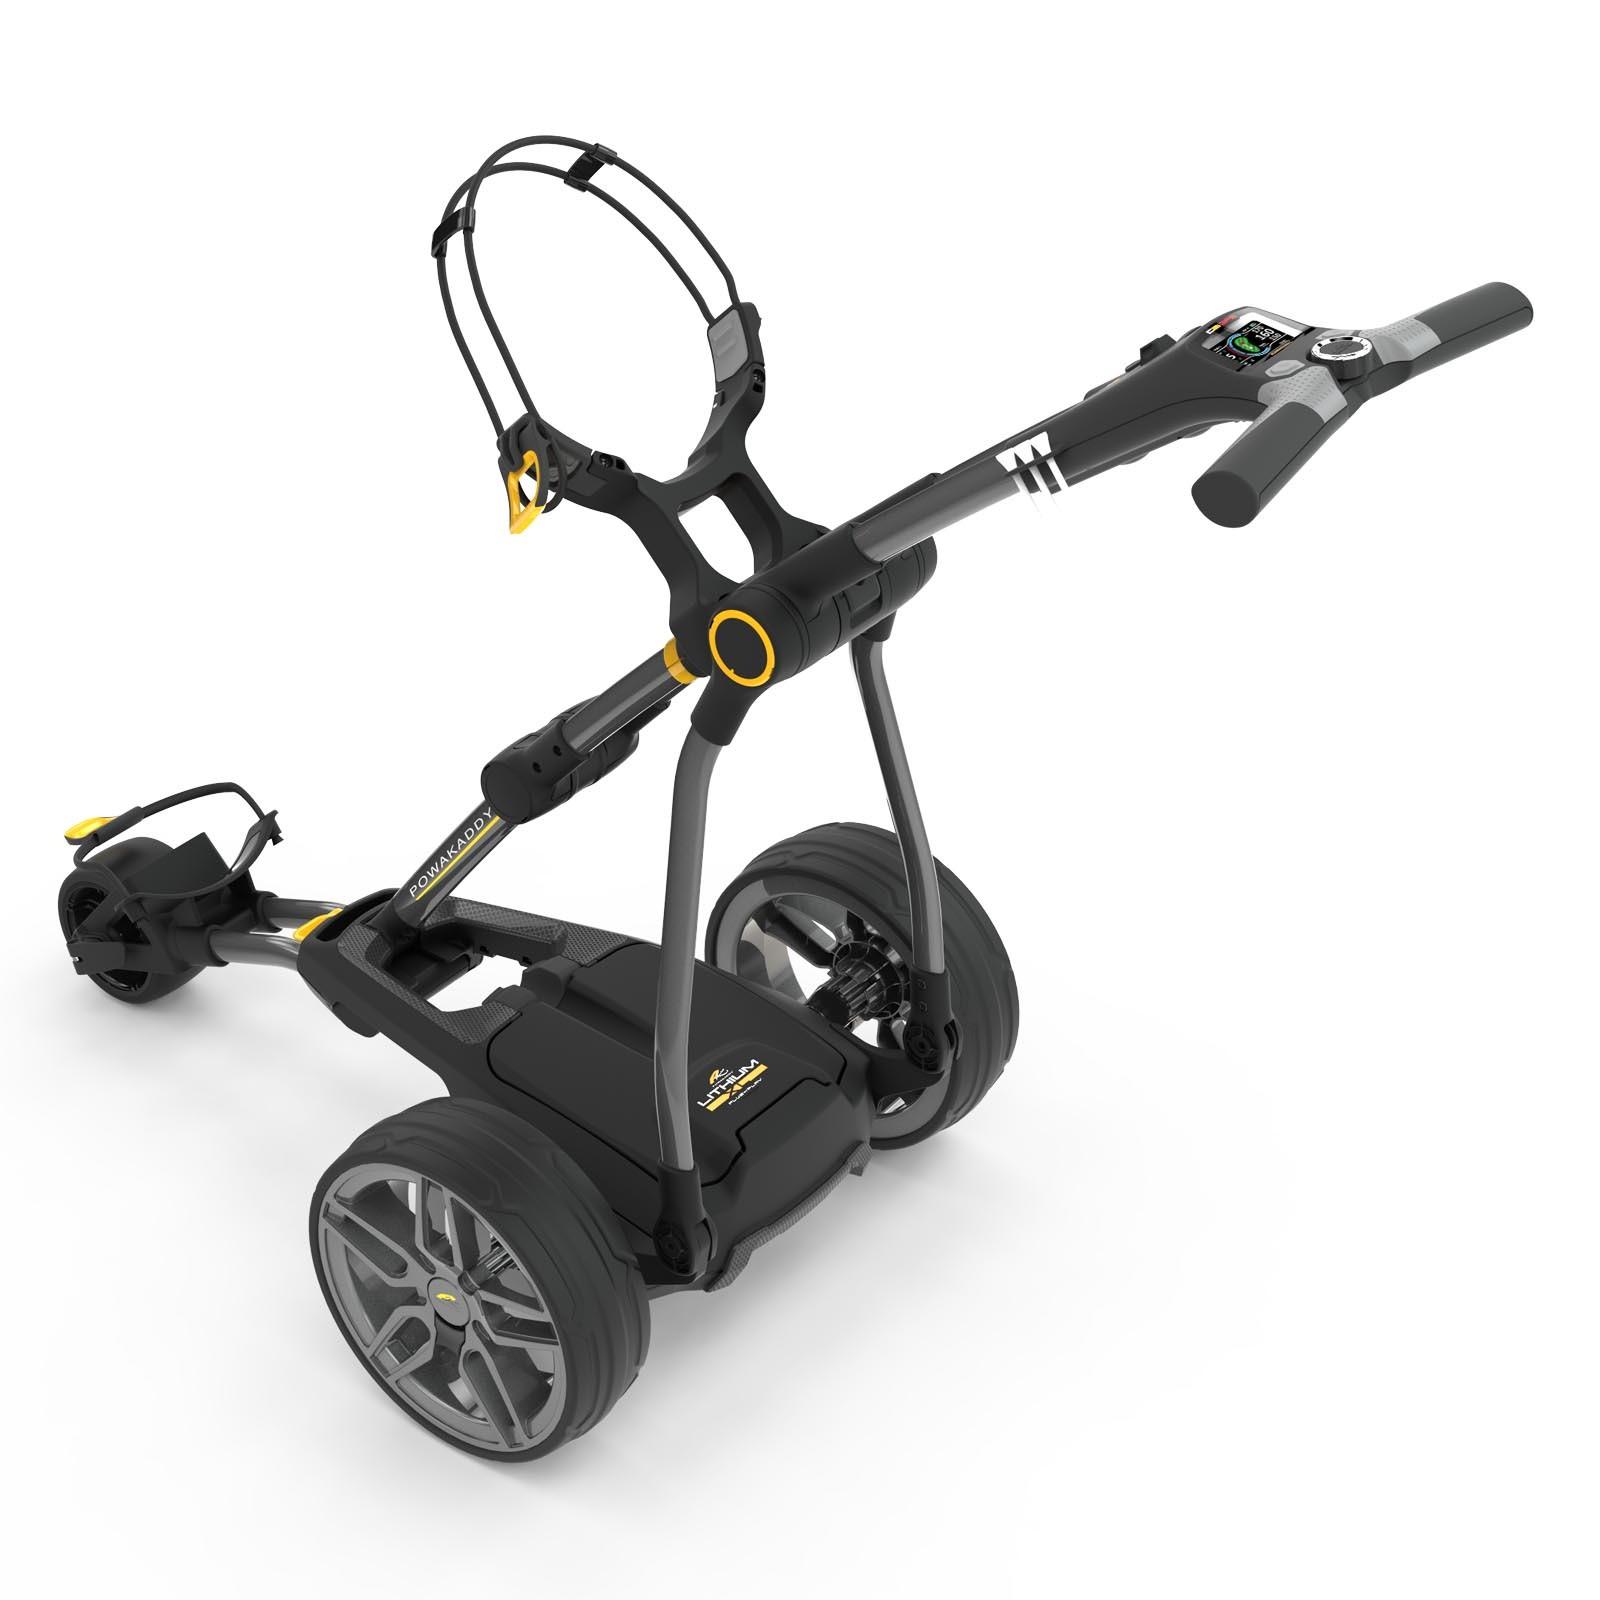 Powakaddy Compact C2i GPS Golf Trolley (36 Hole Lithium Battery)